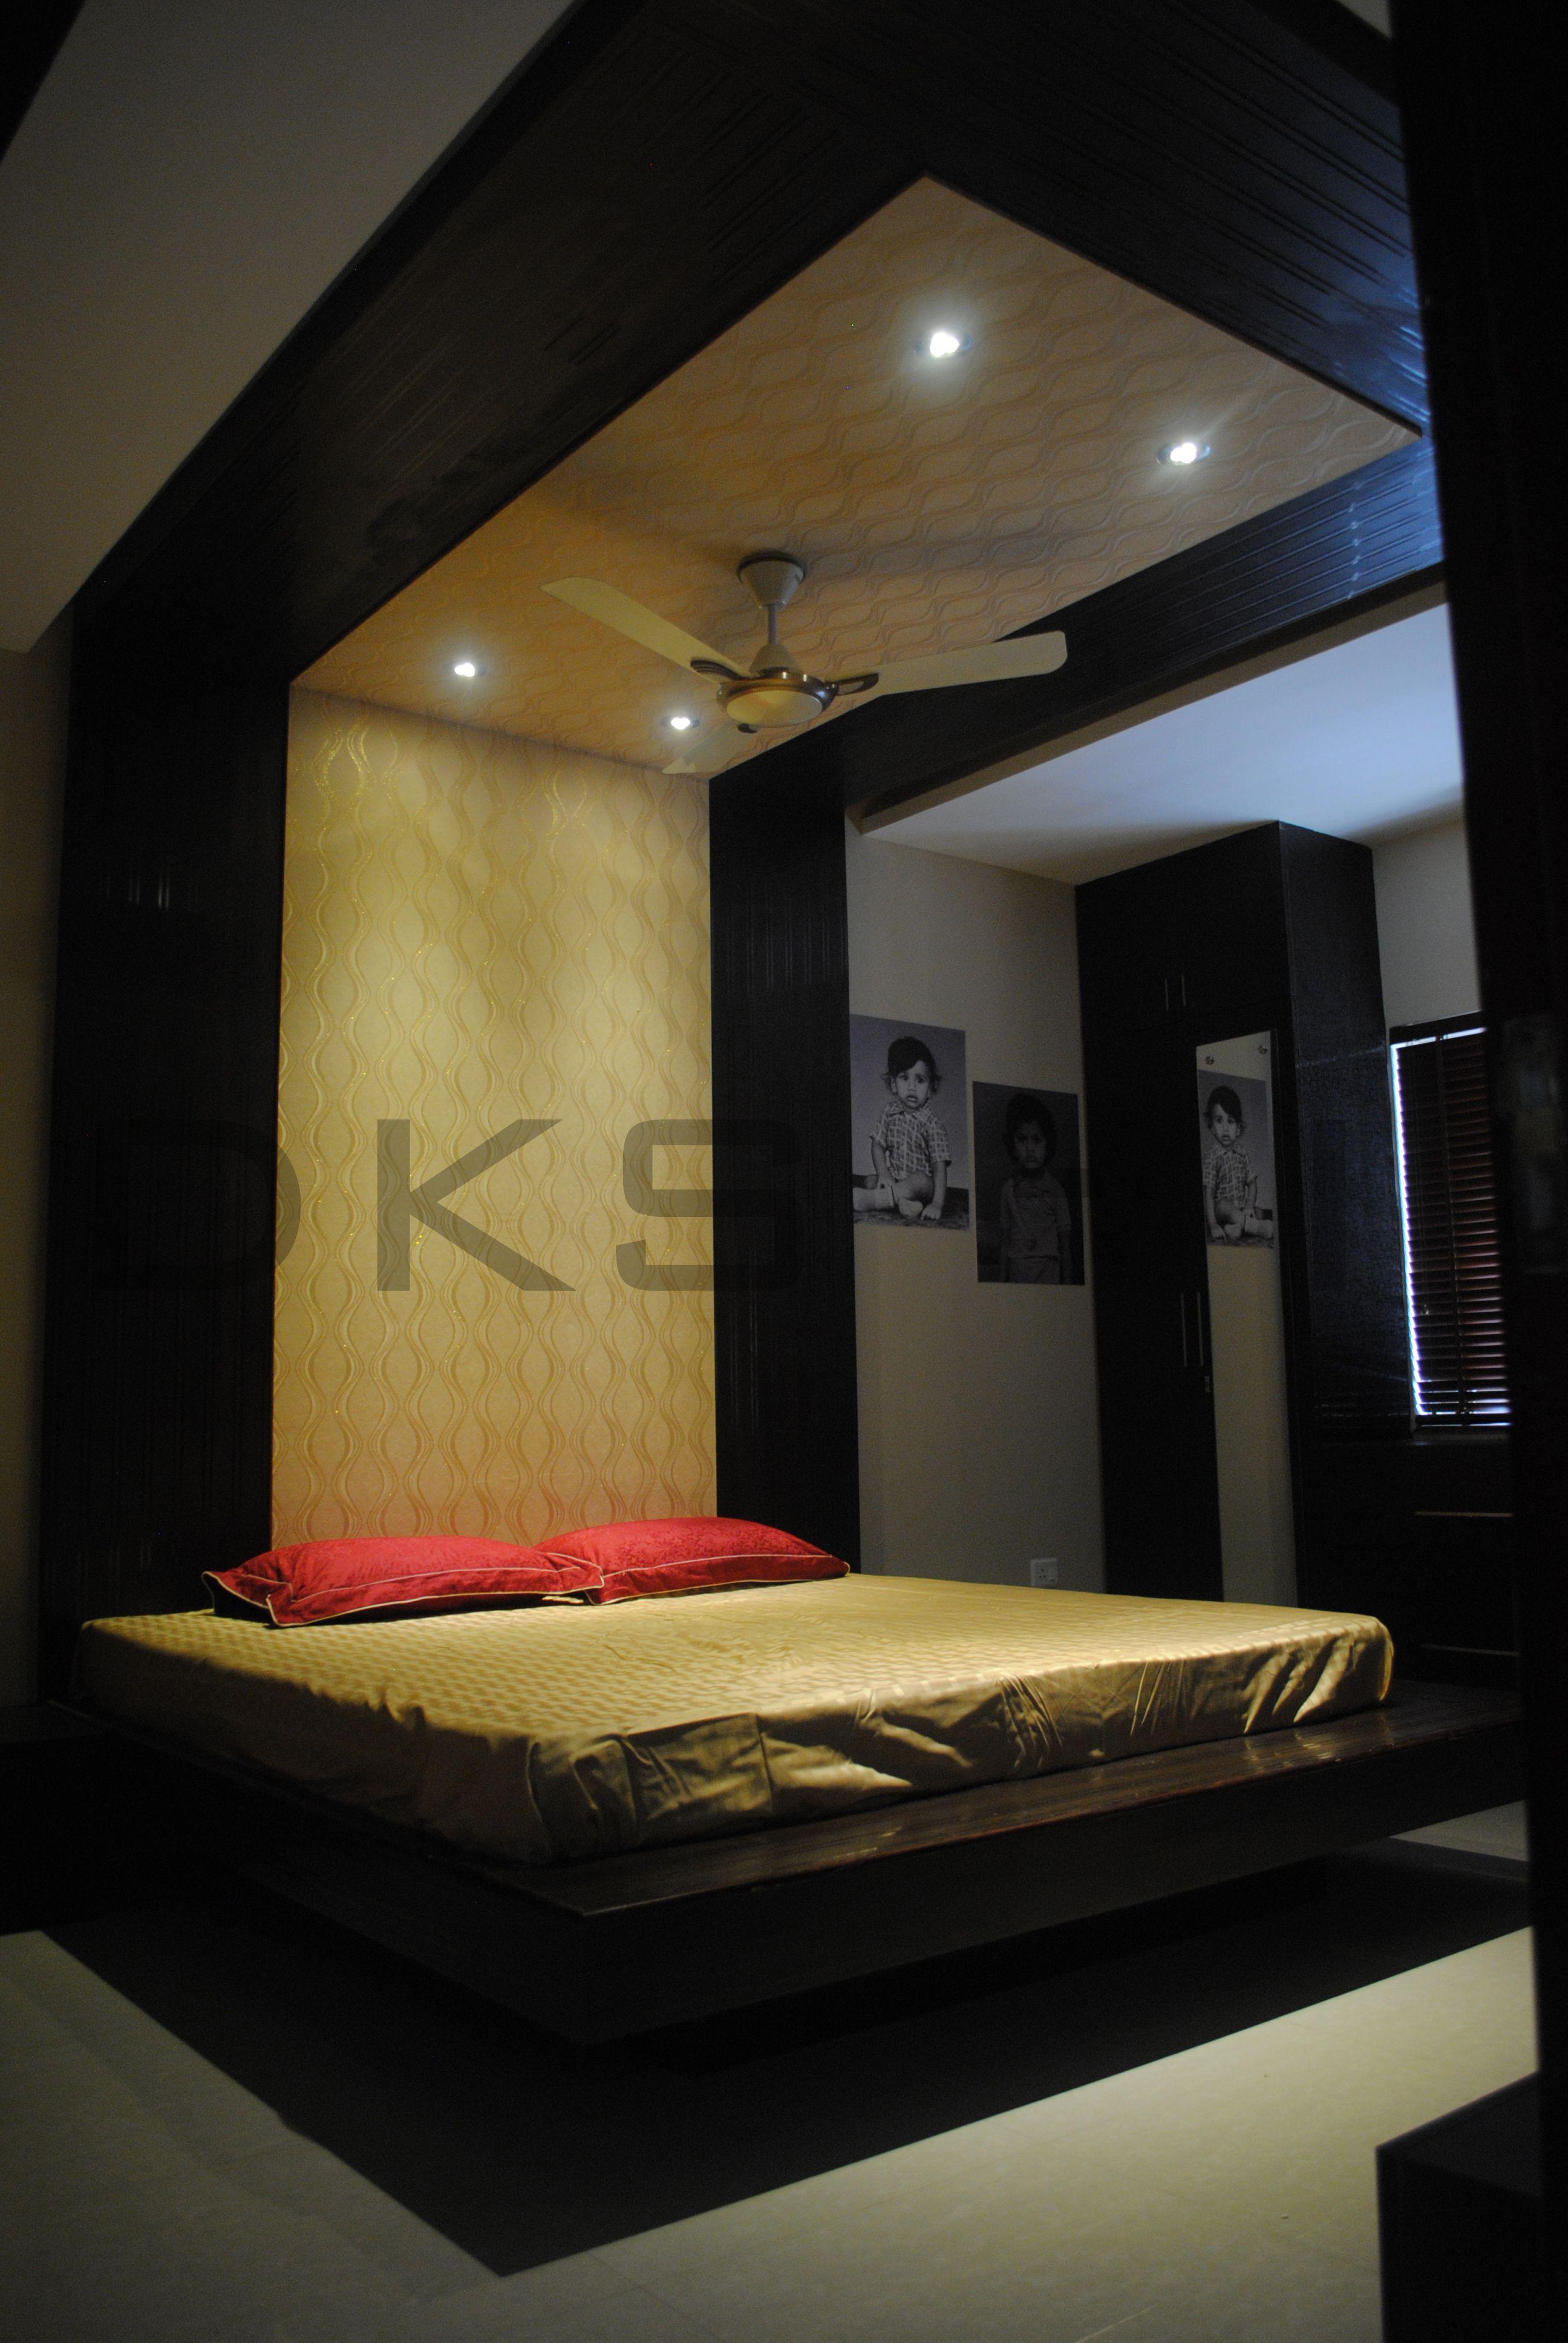 Diy Ideas Divider Headboard Grey Unit White Cot Design Pics Bedroom ...